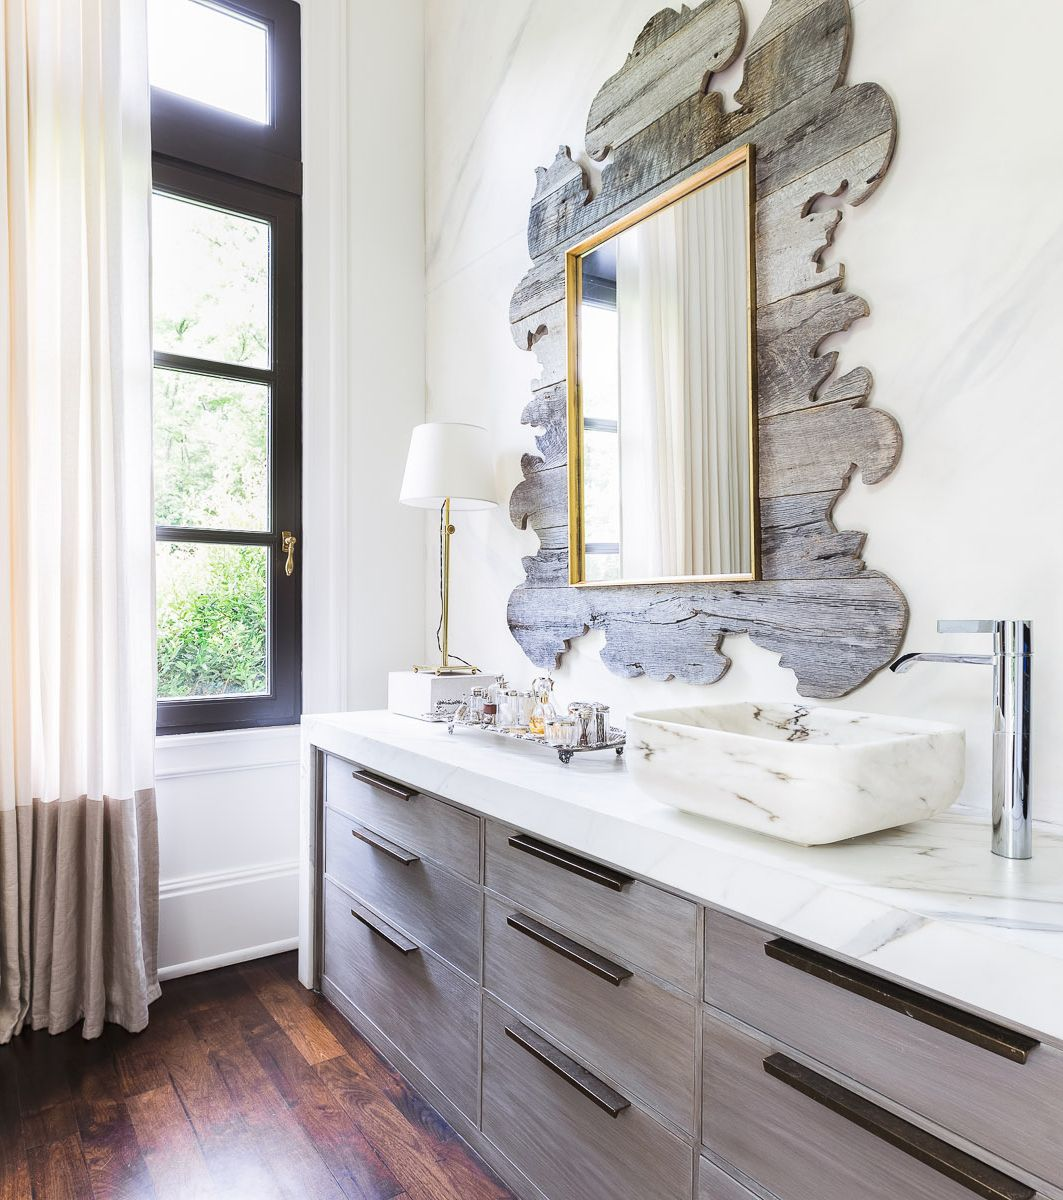 Rustic glam bathroom by Chad James | Interiors: Bathrooms ...